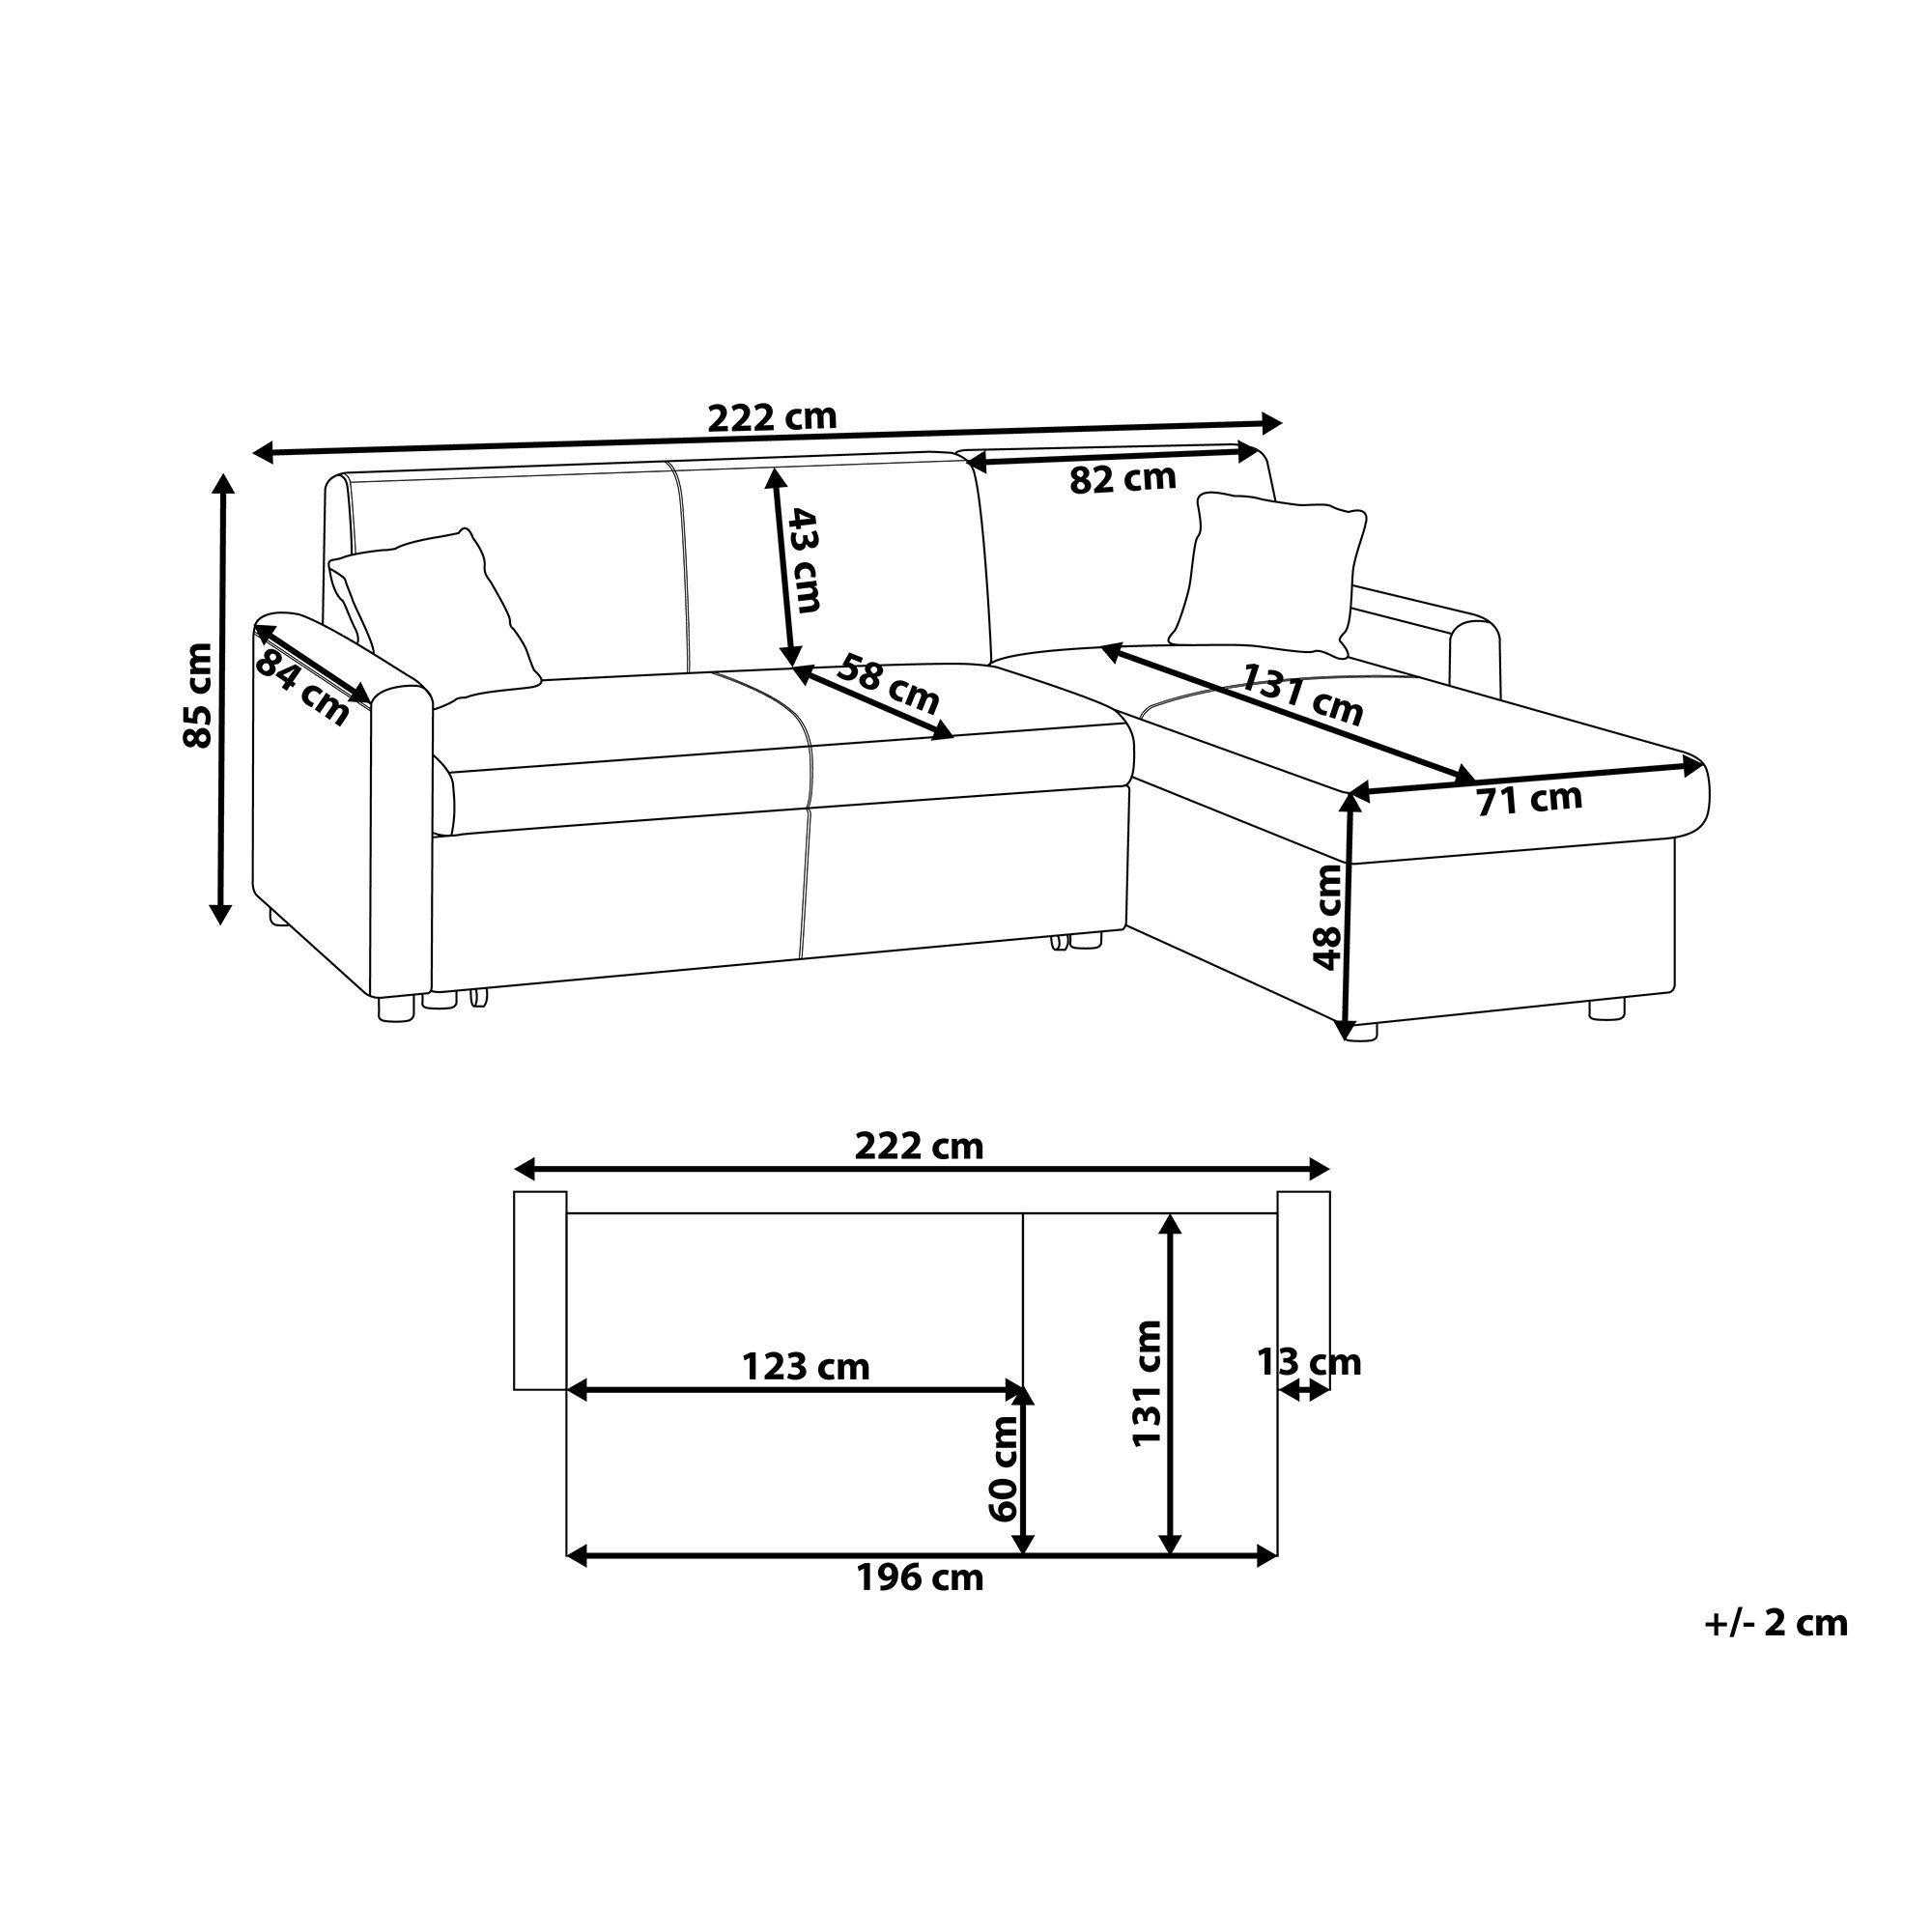 Elegantes Linksseitiges Ecksofa In Lederoptik Mit Schlaffunktion In 2020 Floor Plans